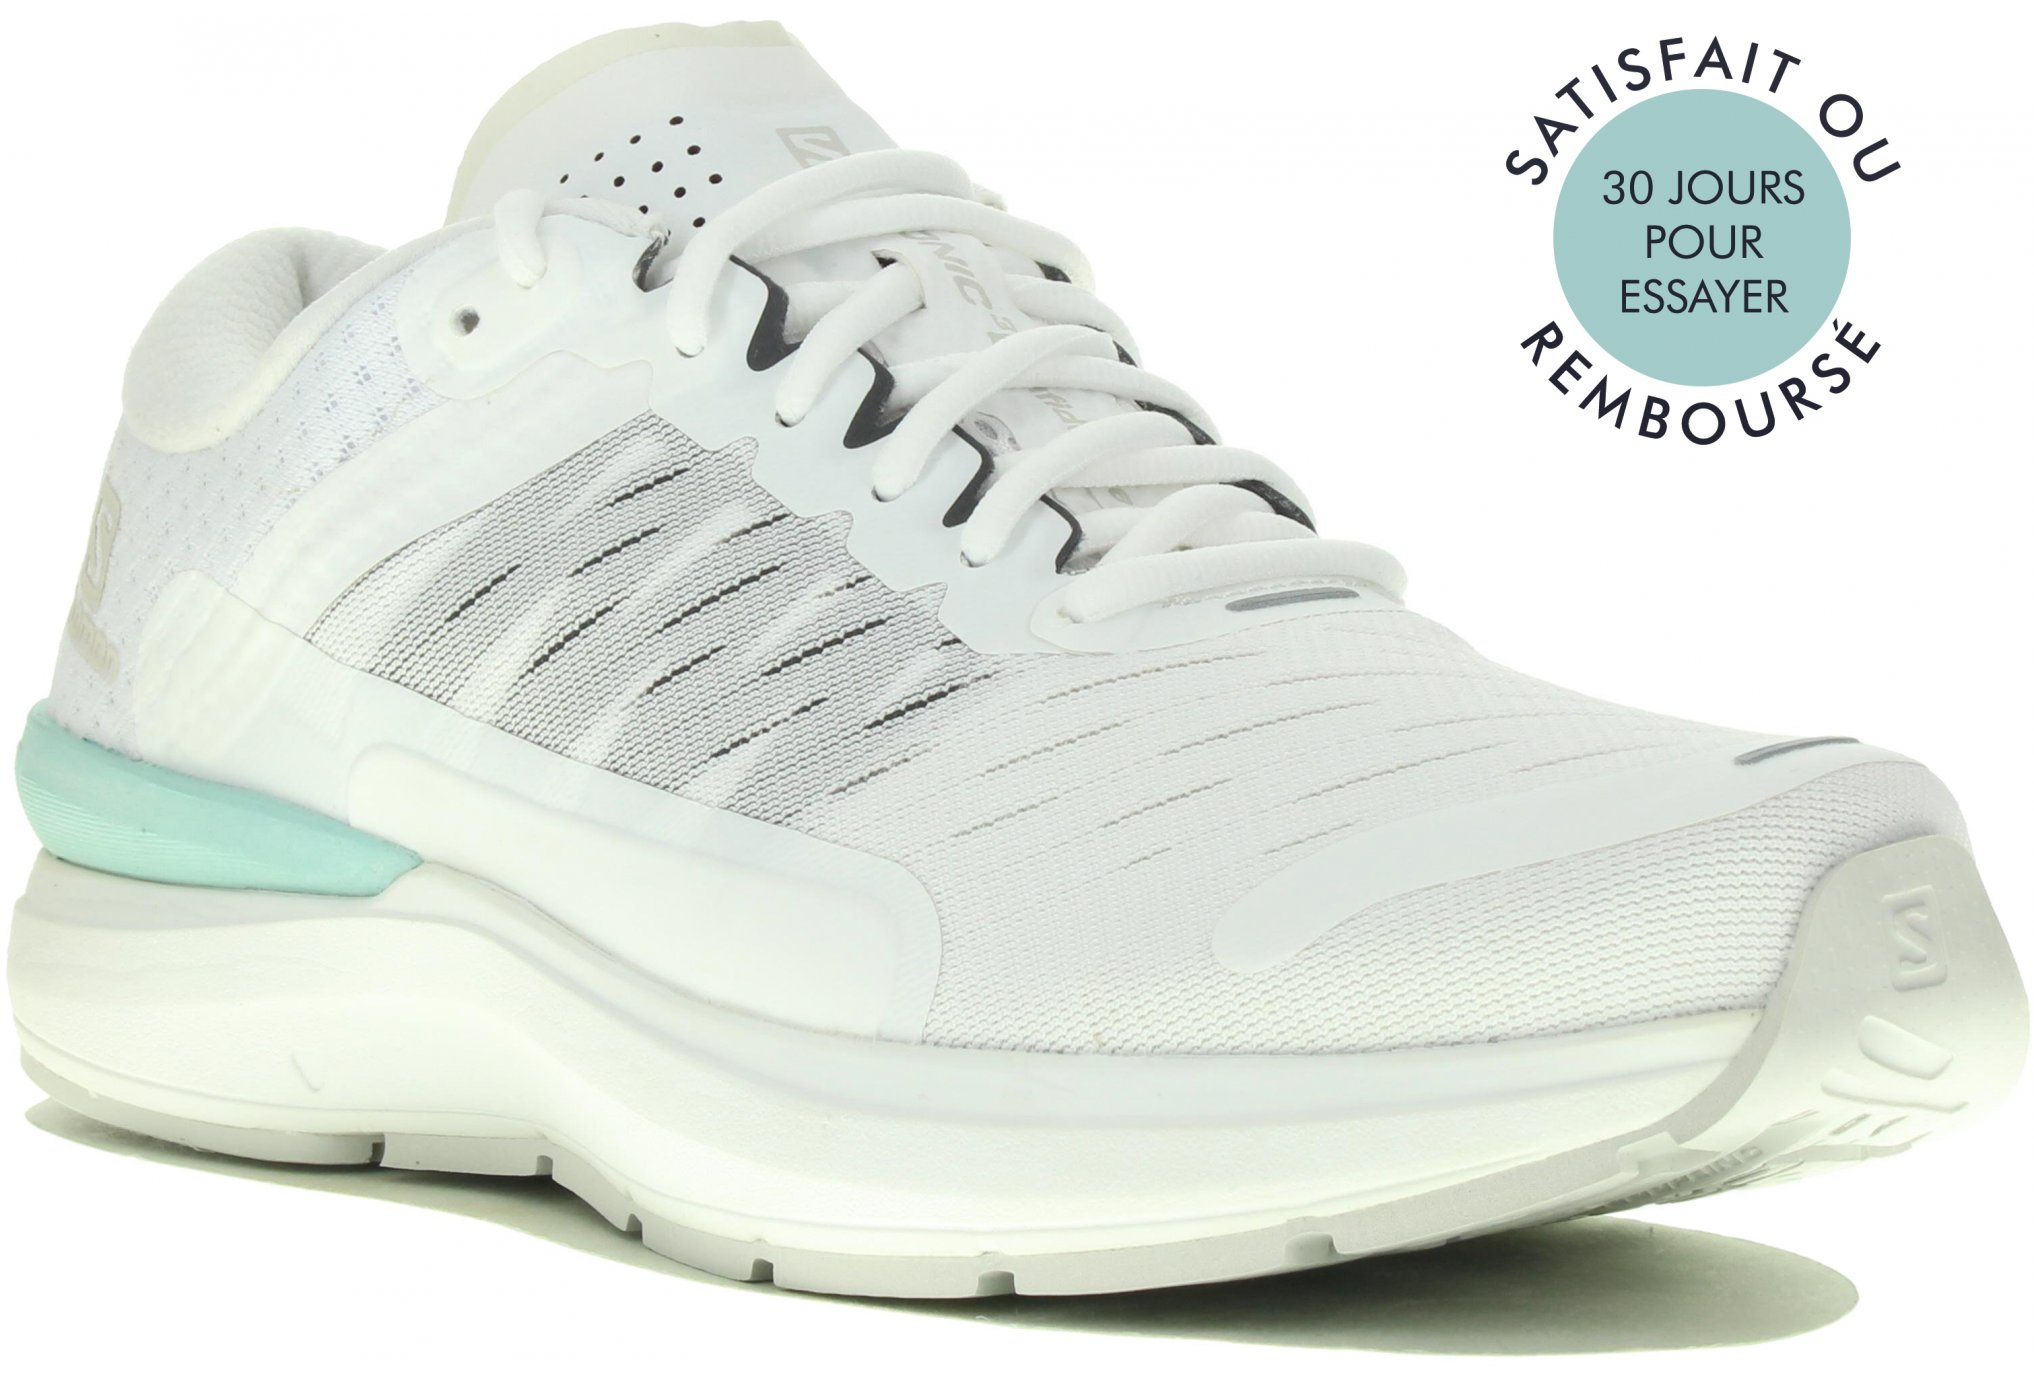 Salomon Sonic 3 Confidence Chaussures running femme